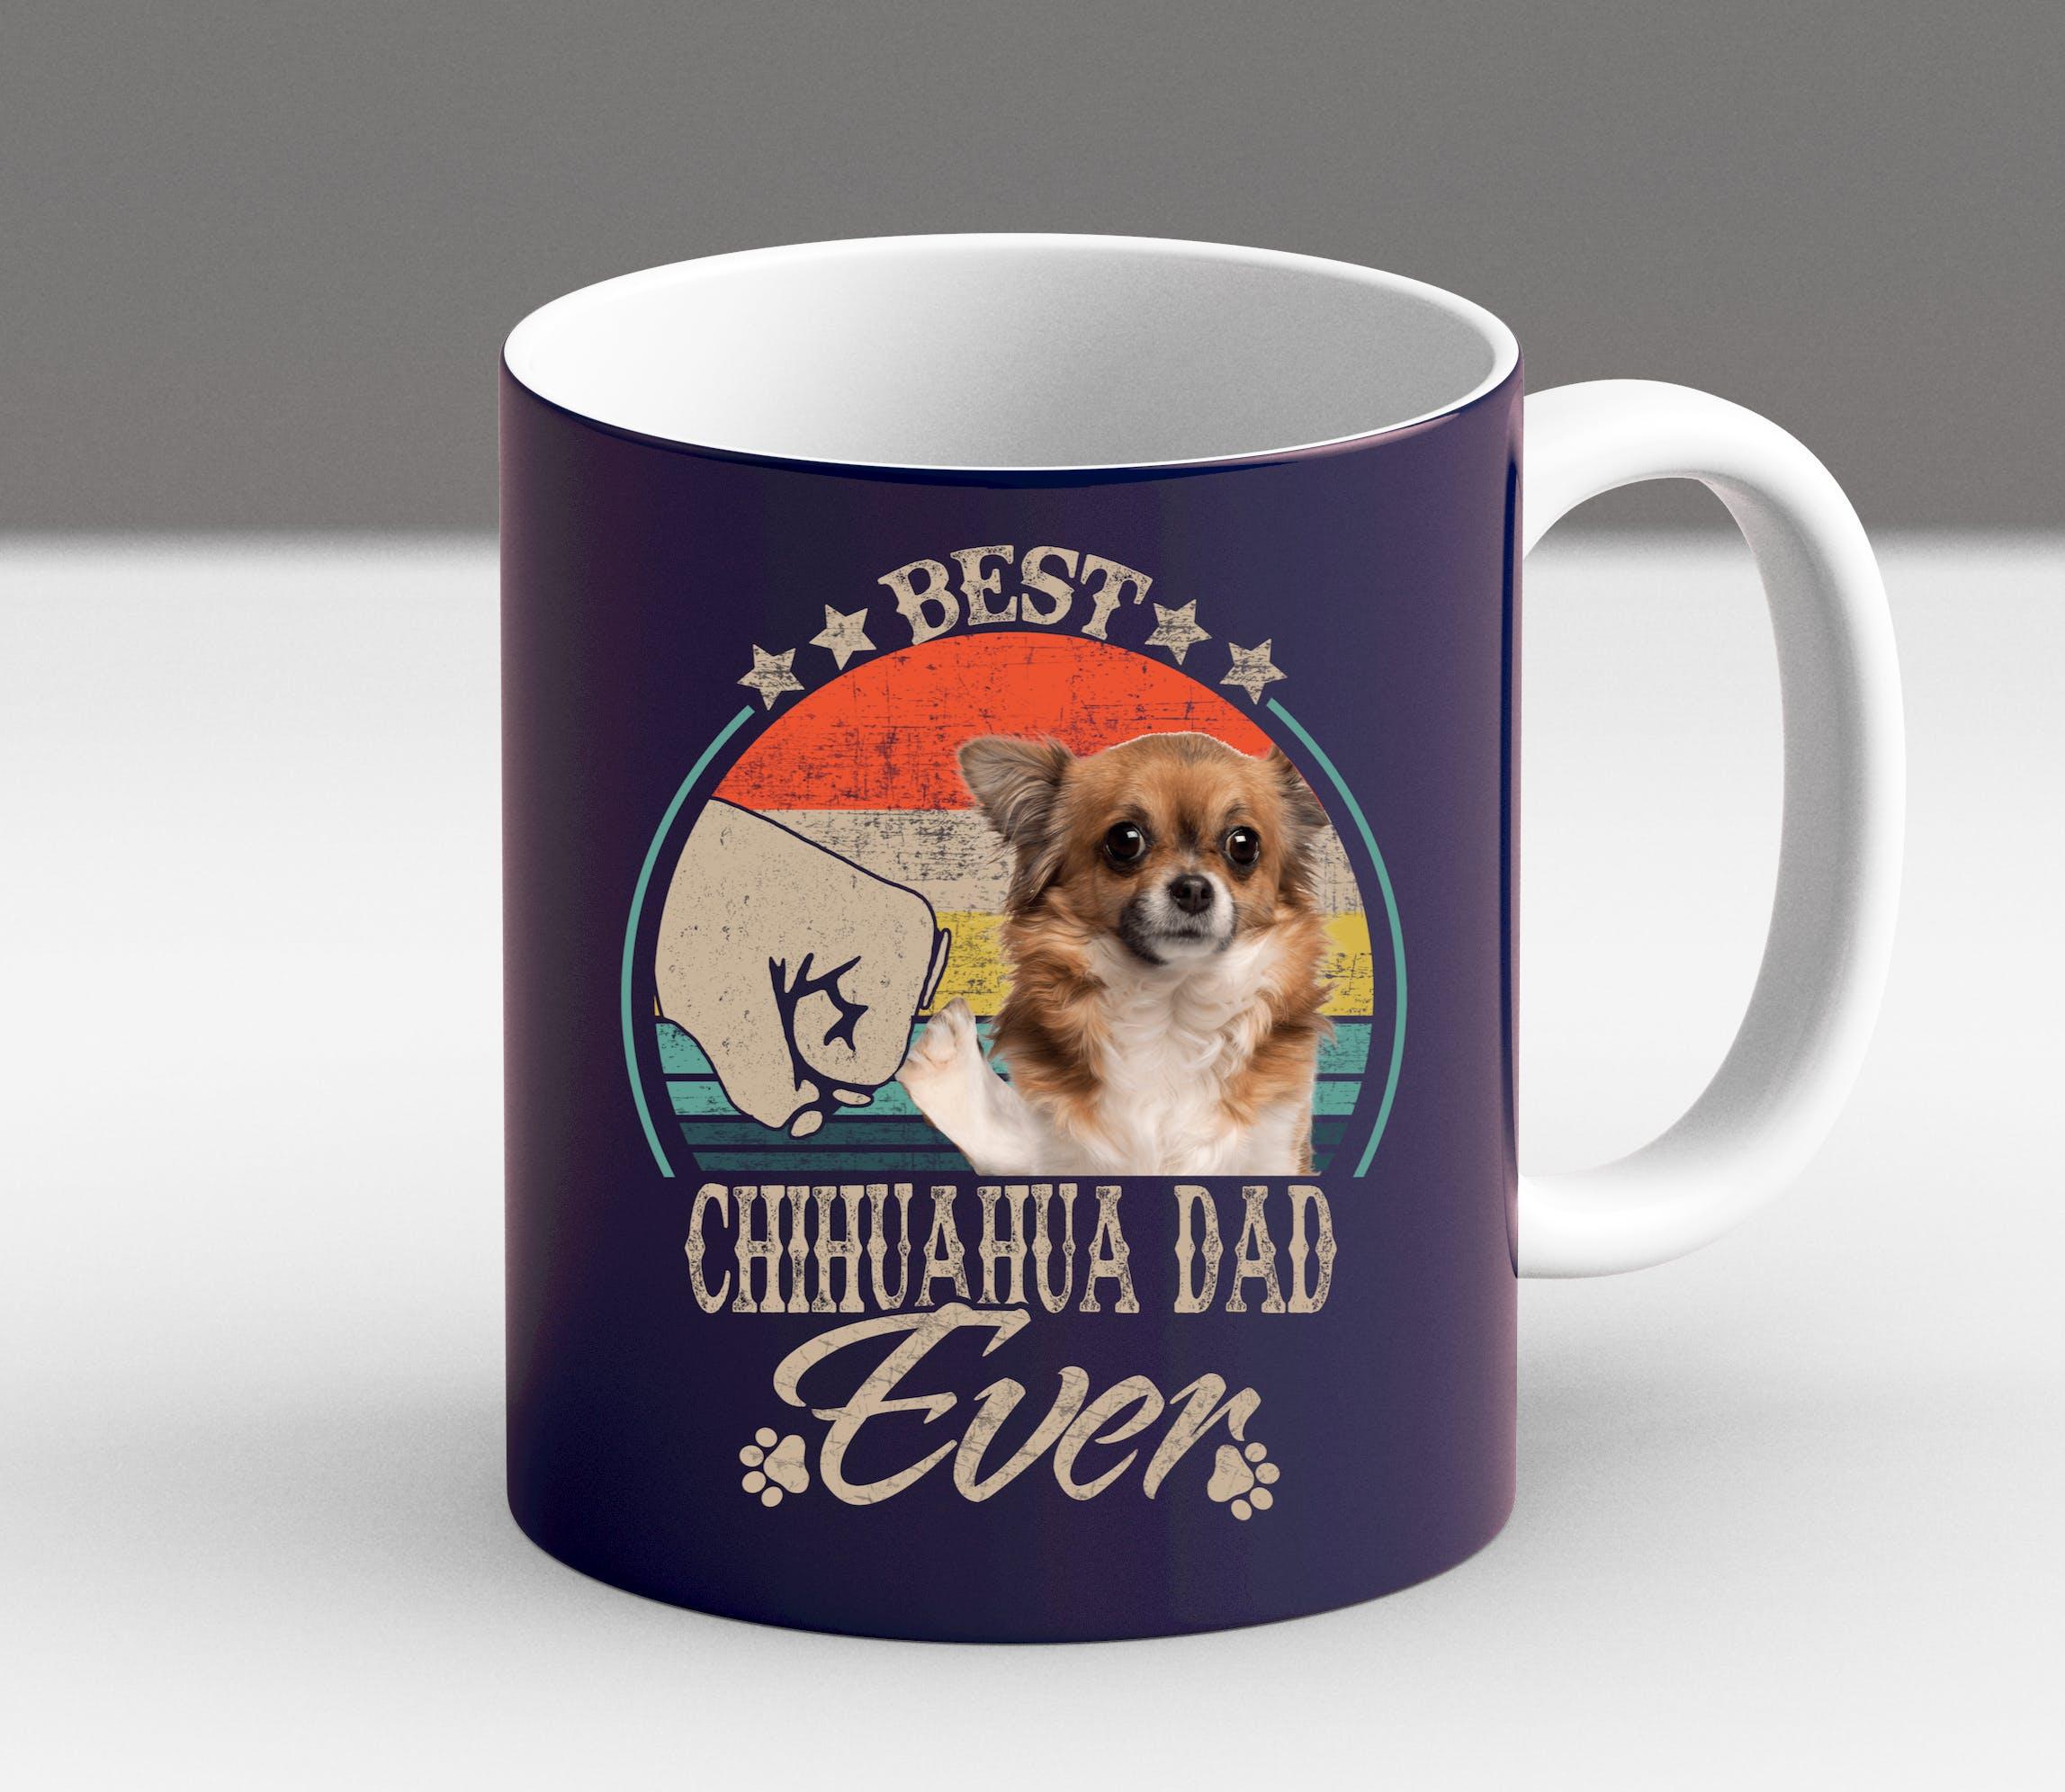 miniature 6 - Funny Chihuahua Owner Mom Dad Gift Christmas Fur Vintage Coffee Mug